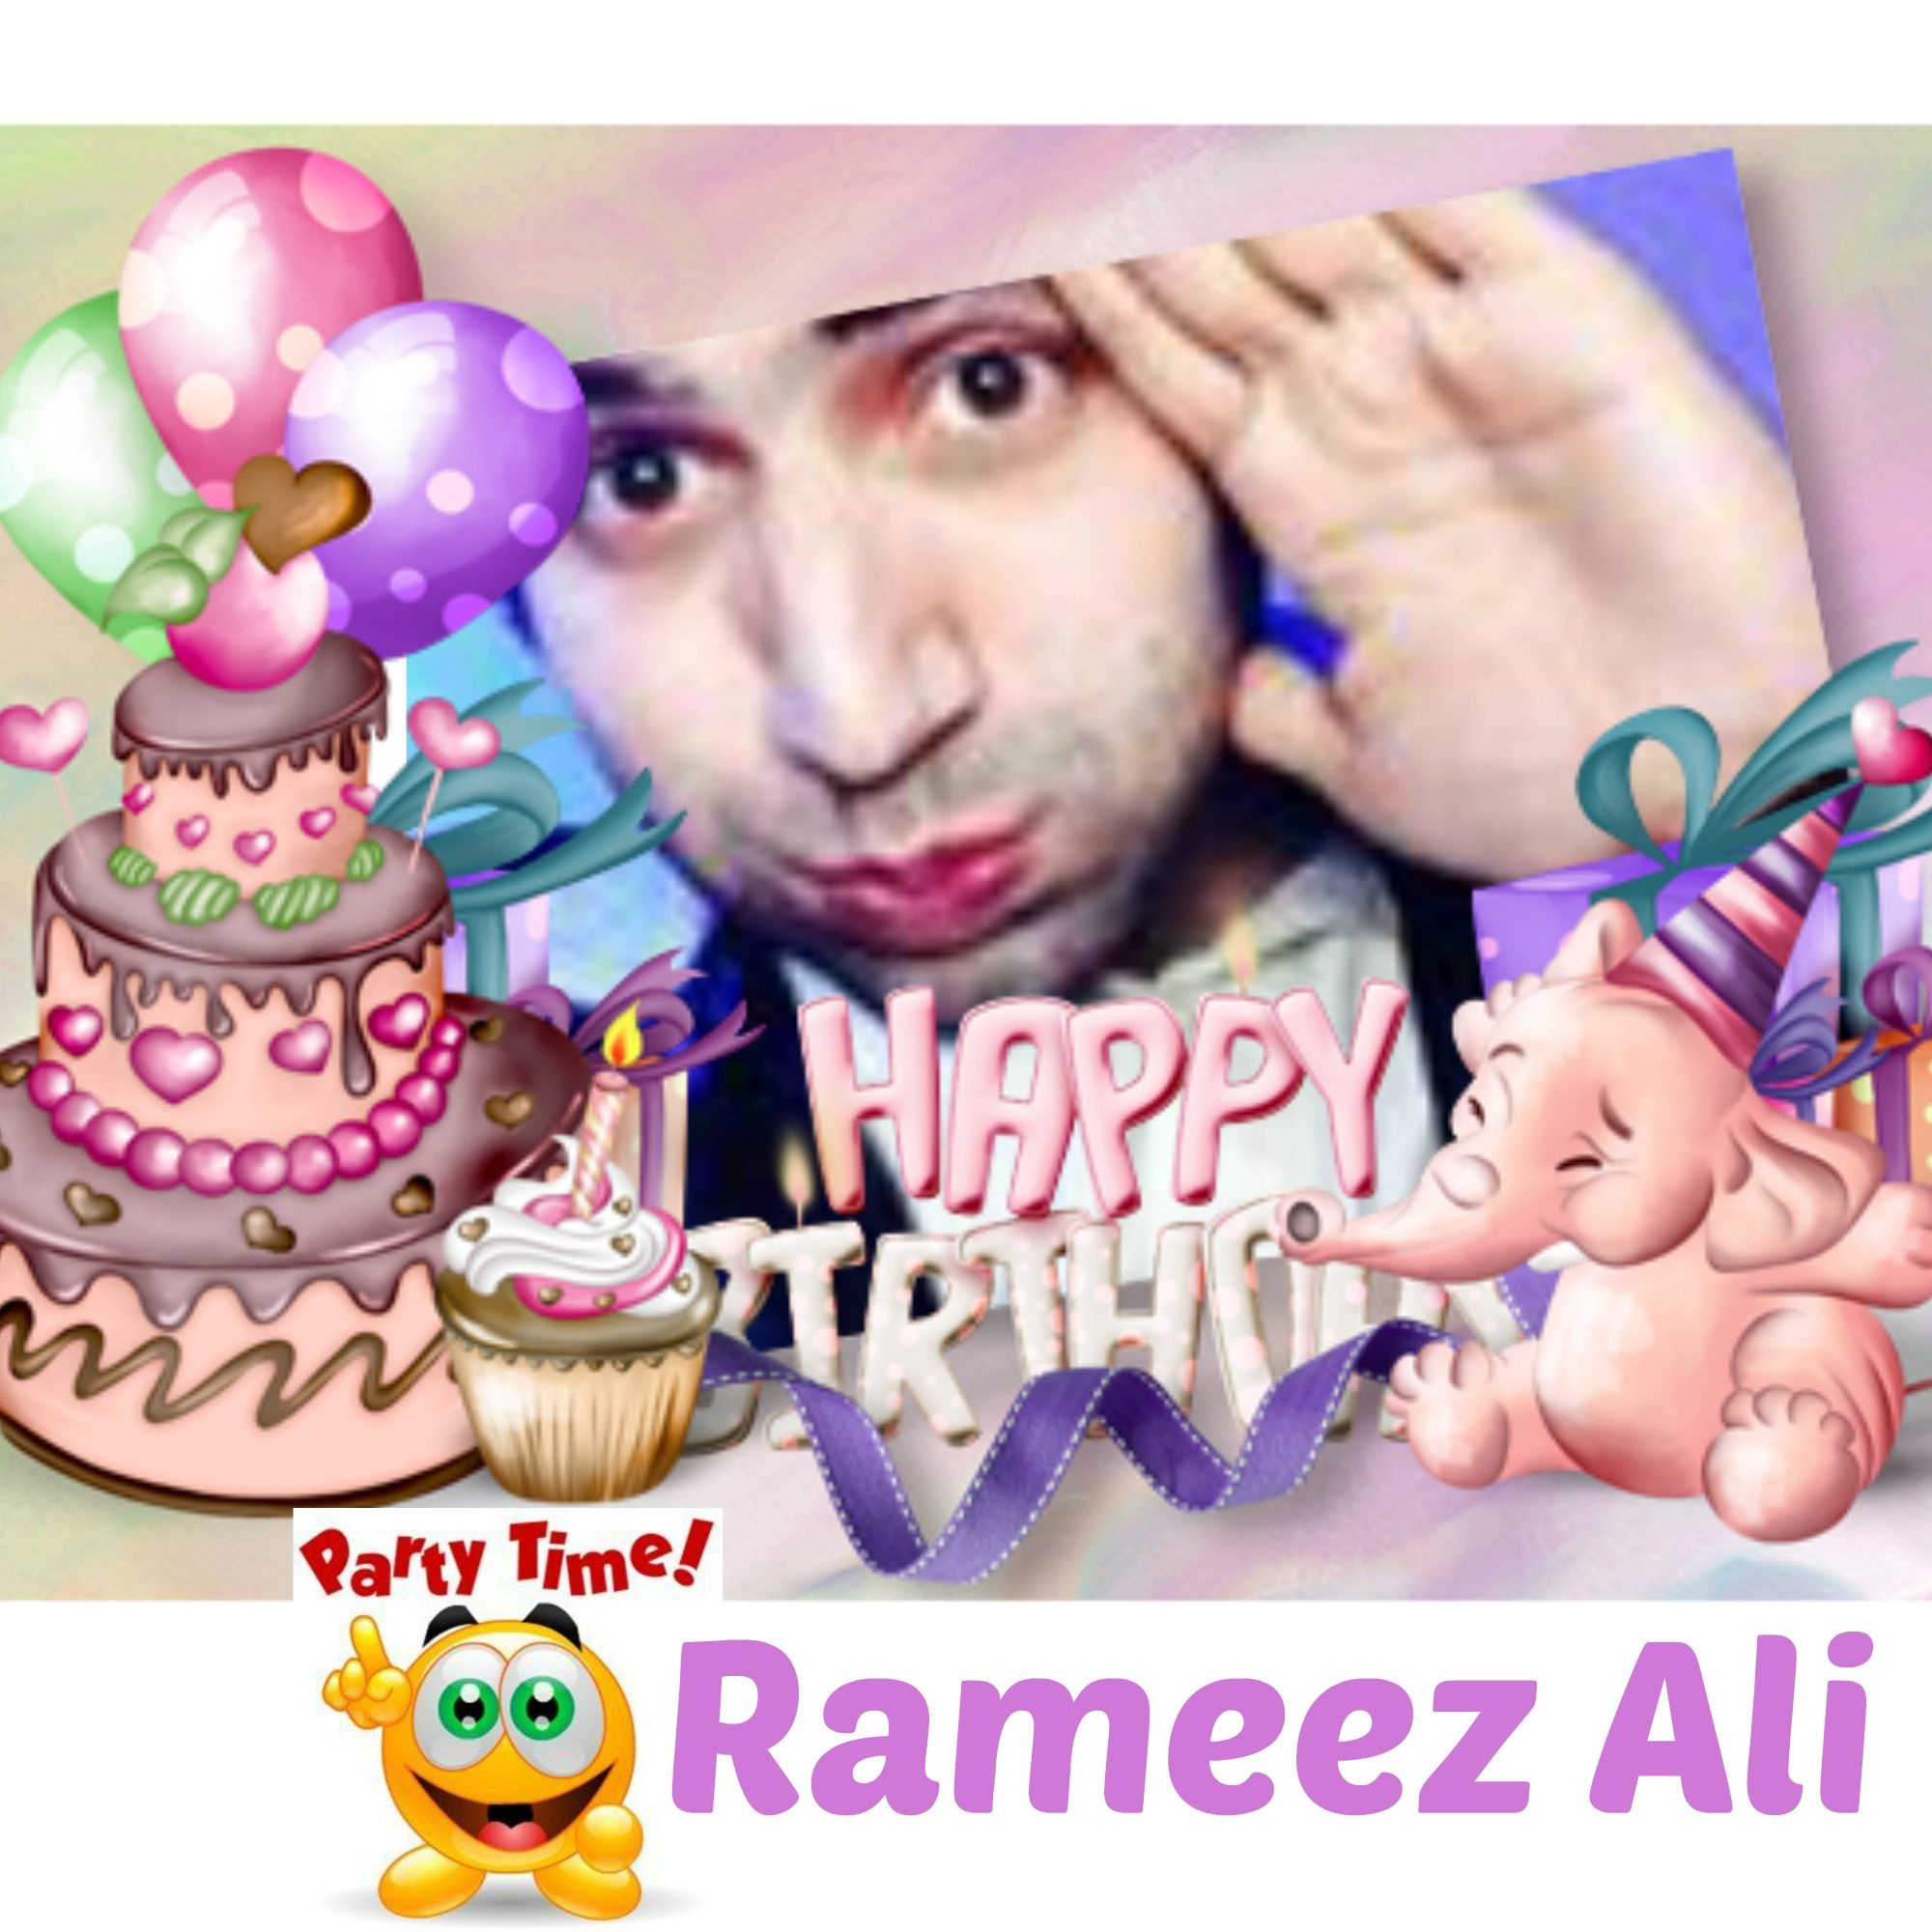 Ali, Happy Birthday, Happy Brithday, Happy B Day, Urari La